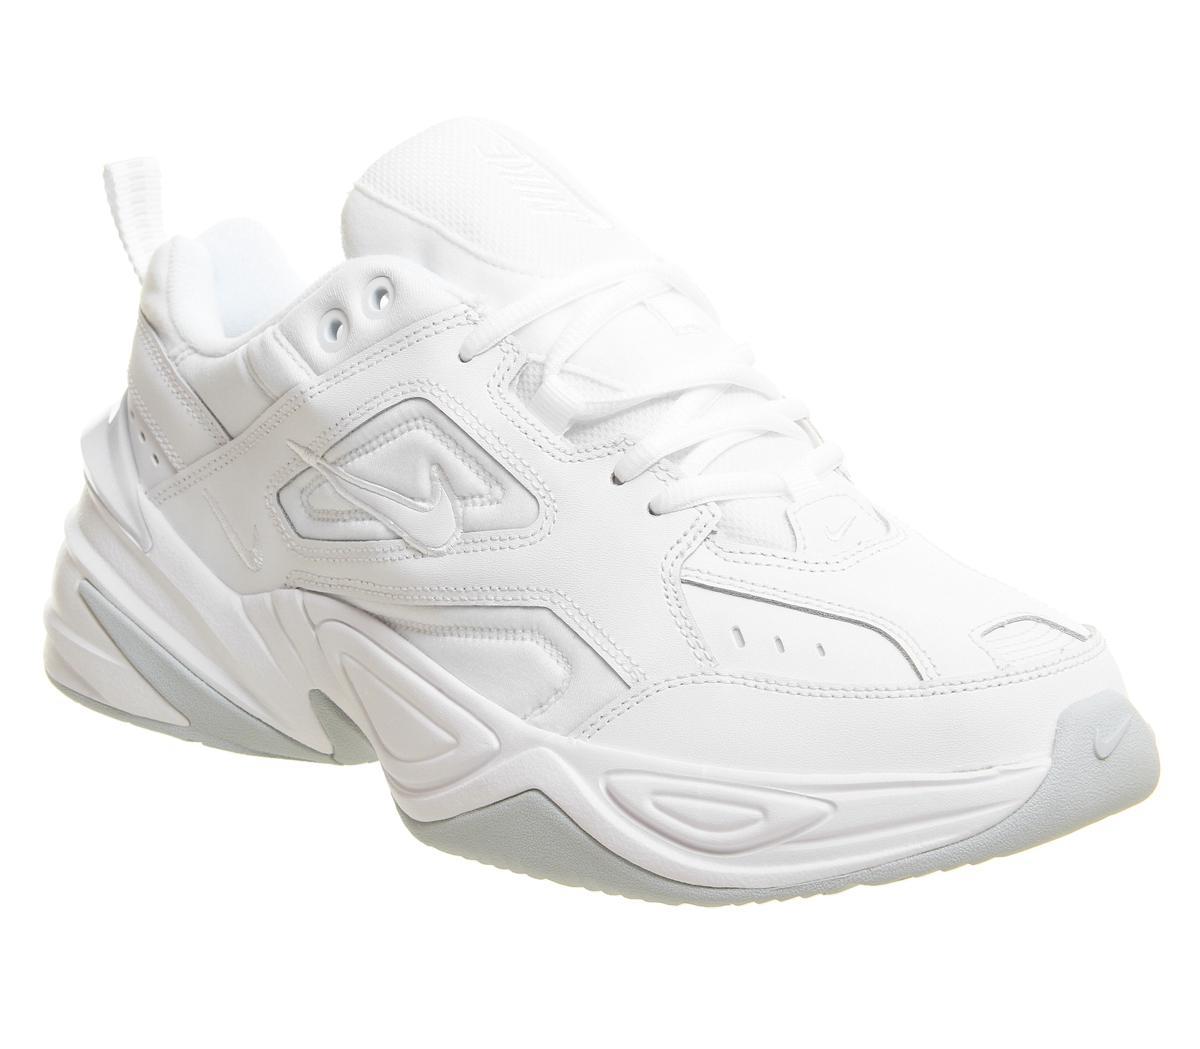 Nike M2k Tekno Trainers White Pure